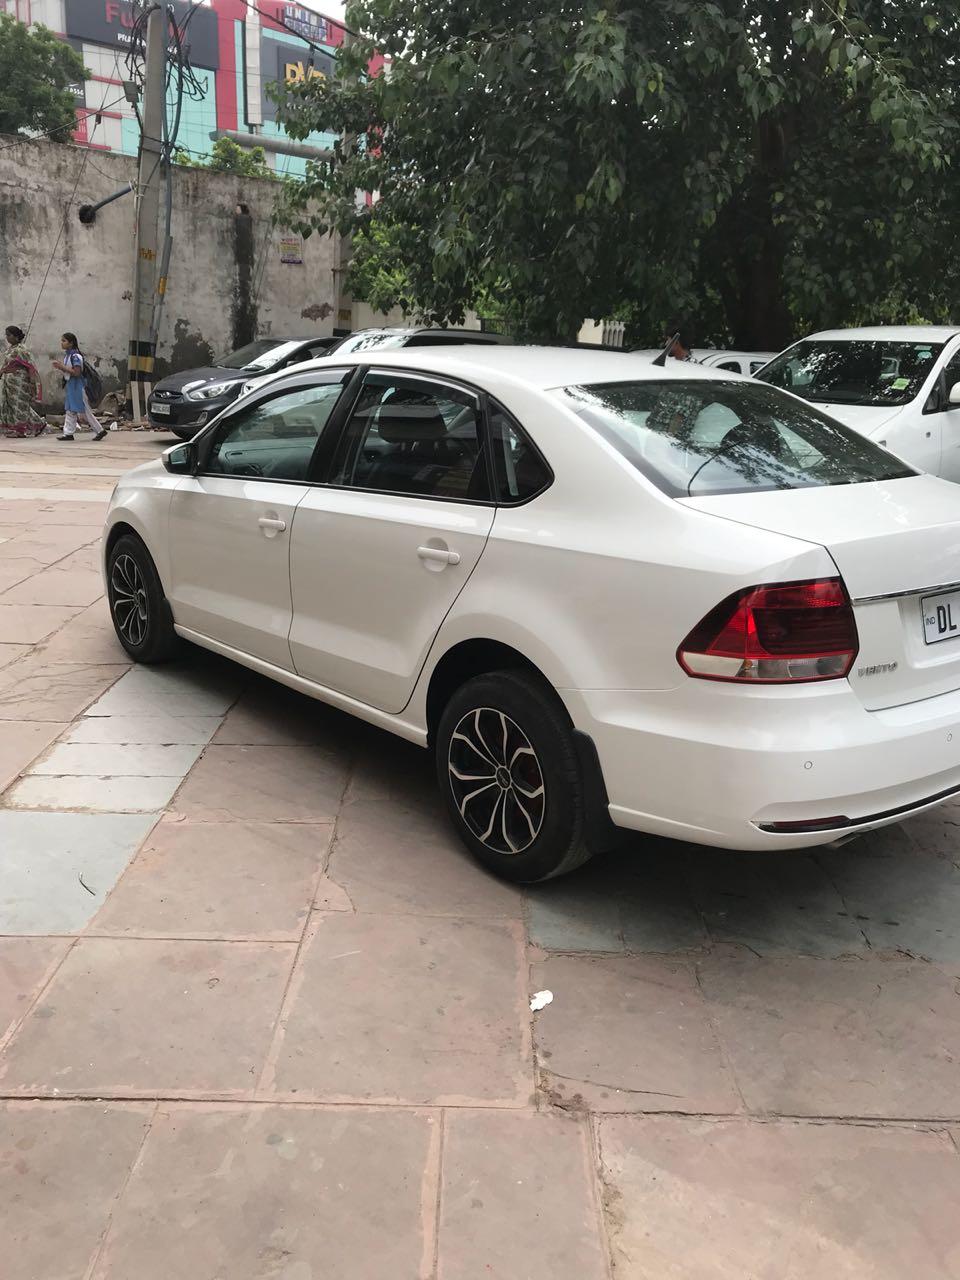 2015 Used Volkswagen Vento COMFORTLINE 1.2 PETROL AT